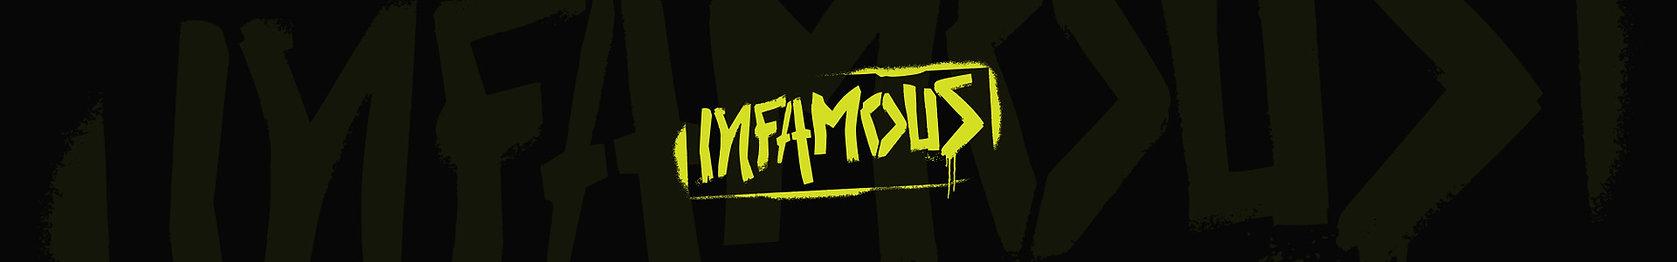 LogoBar_LosAngelesInfamous.jpg